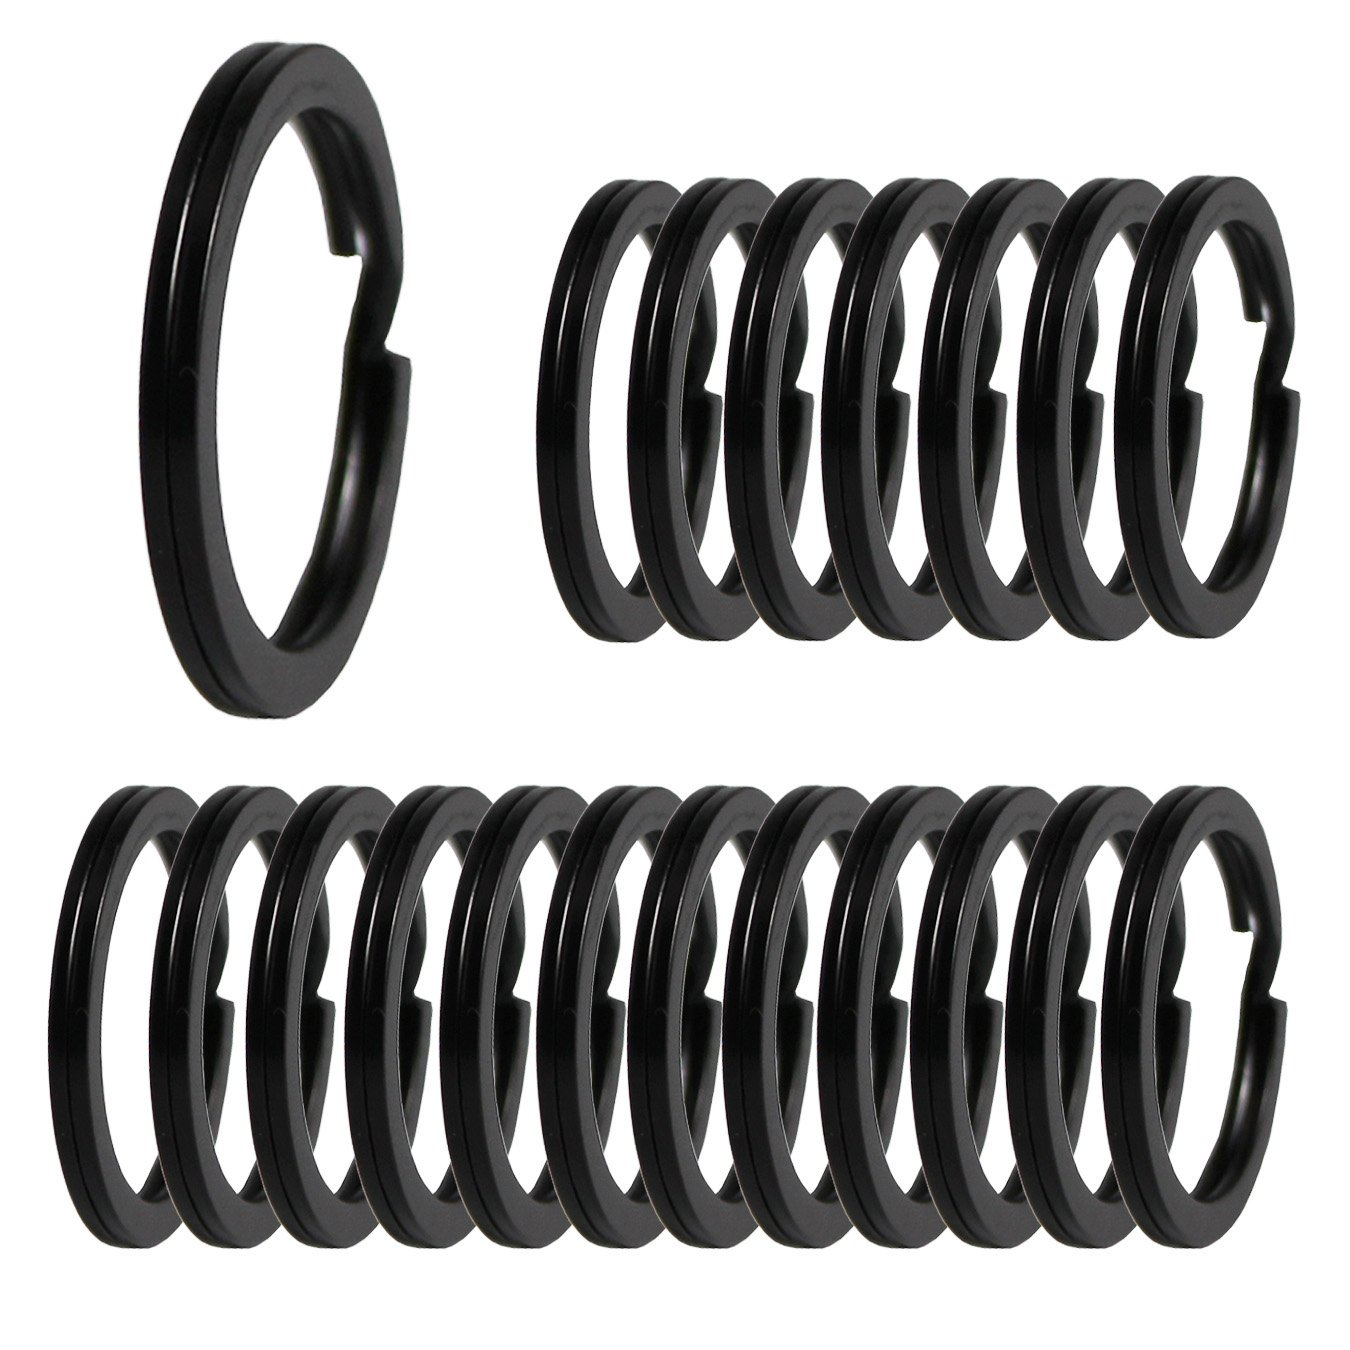 Schwarz UOOOM 20Stk Metall Schl/üsselring Split Ringe /Ø 30mm